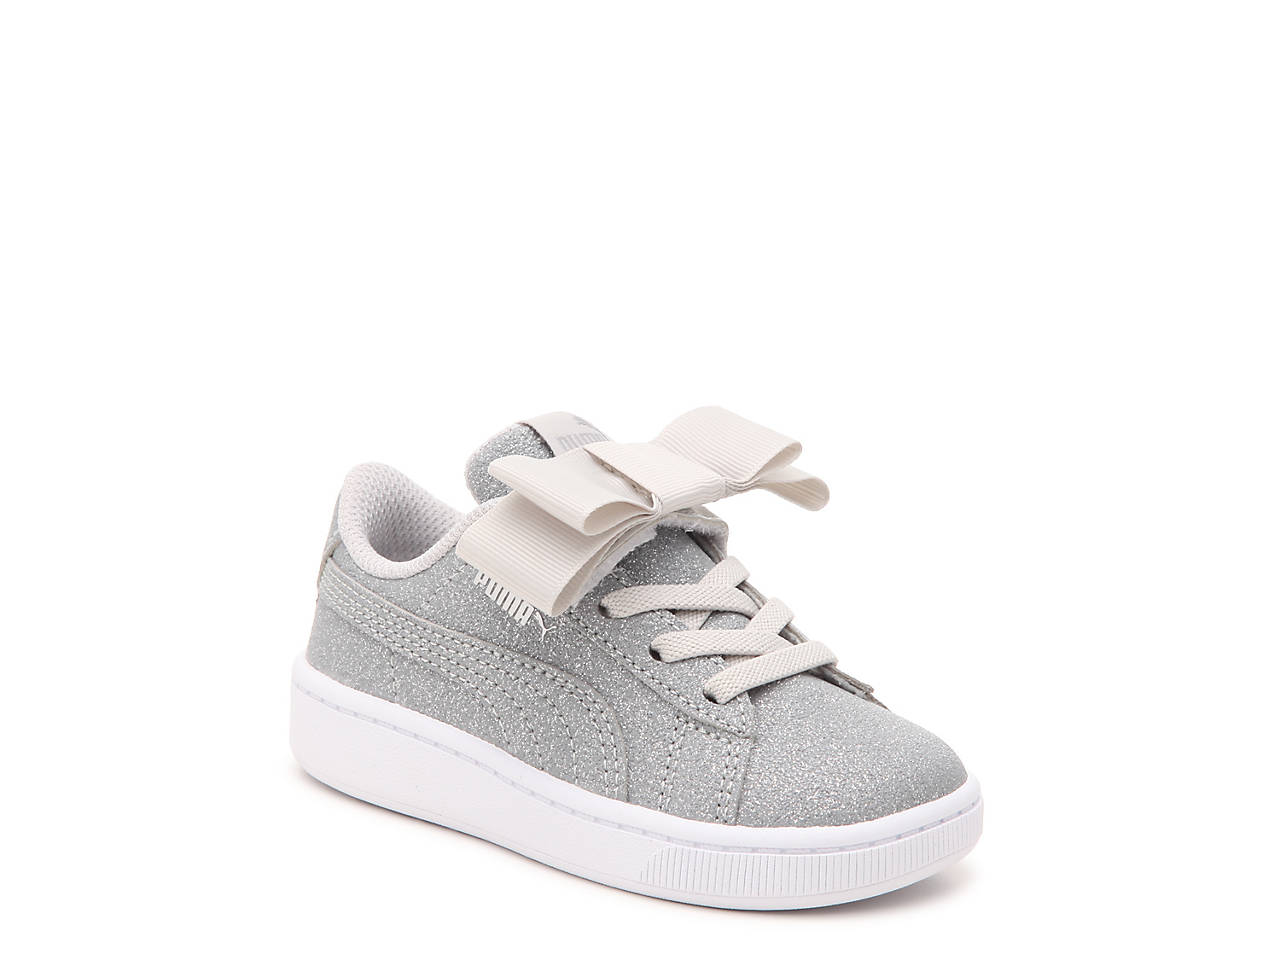 Sneaker Kids' V2 Kids ShoesDsw Puma Ribbon Vikky b7y6Yfg